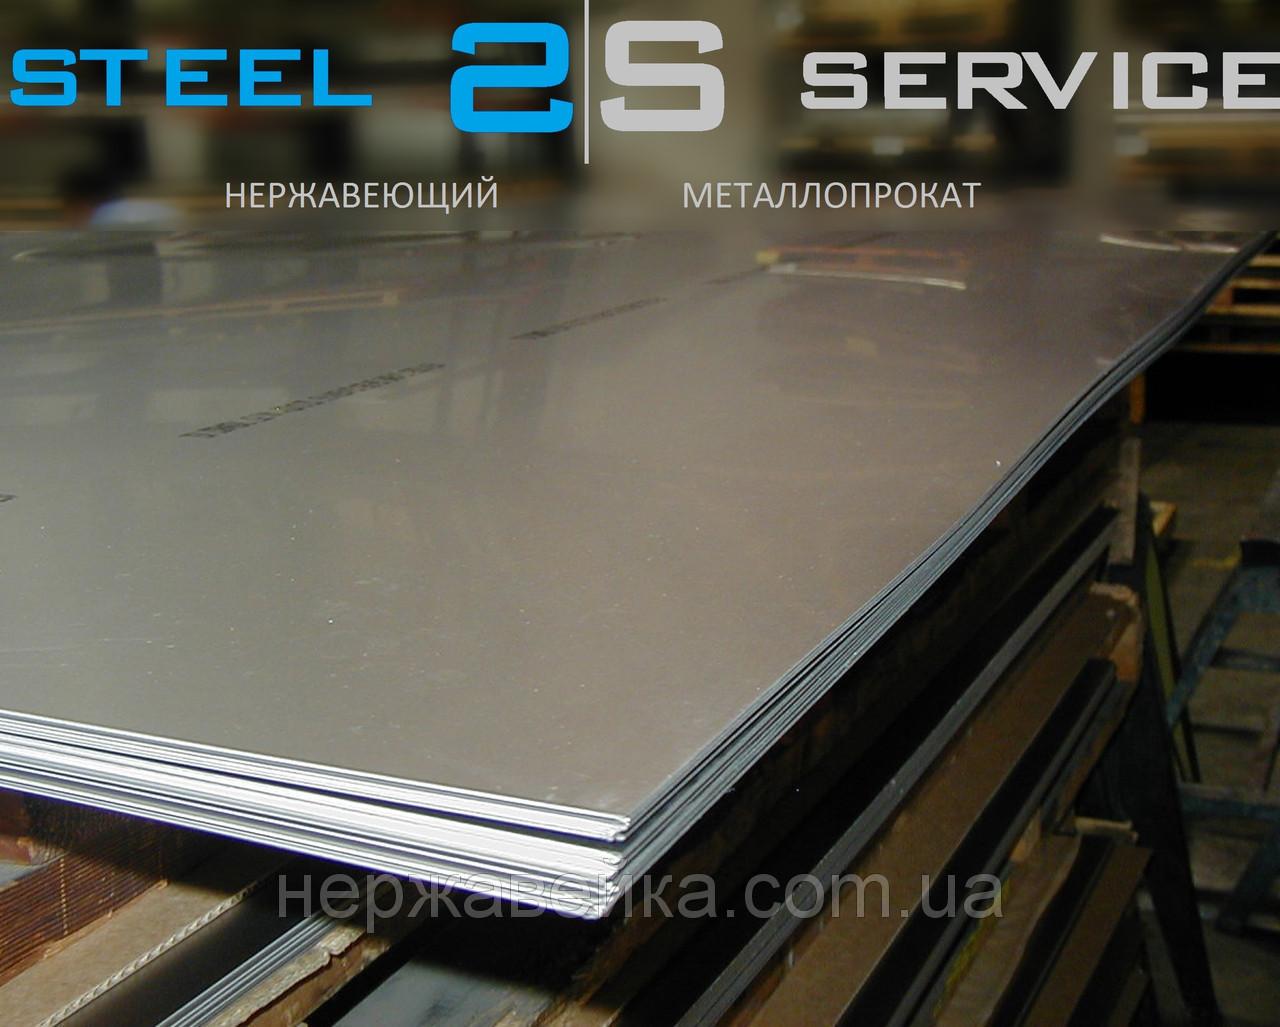 Нержавейка лист 2х1000х2000мм  AISI 316L(03Х17Н14М3) 2B - матовый,  кислотостойкий